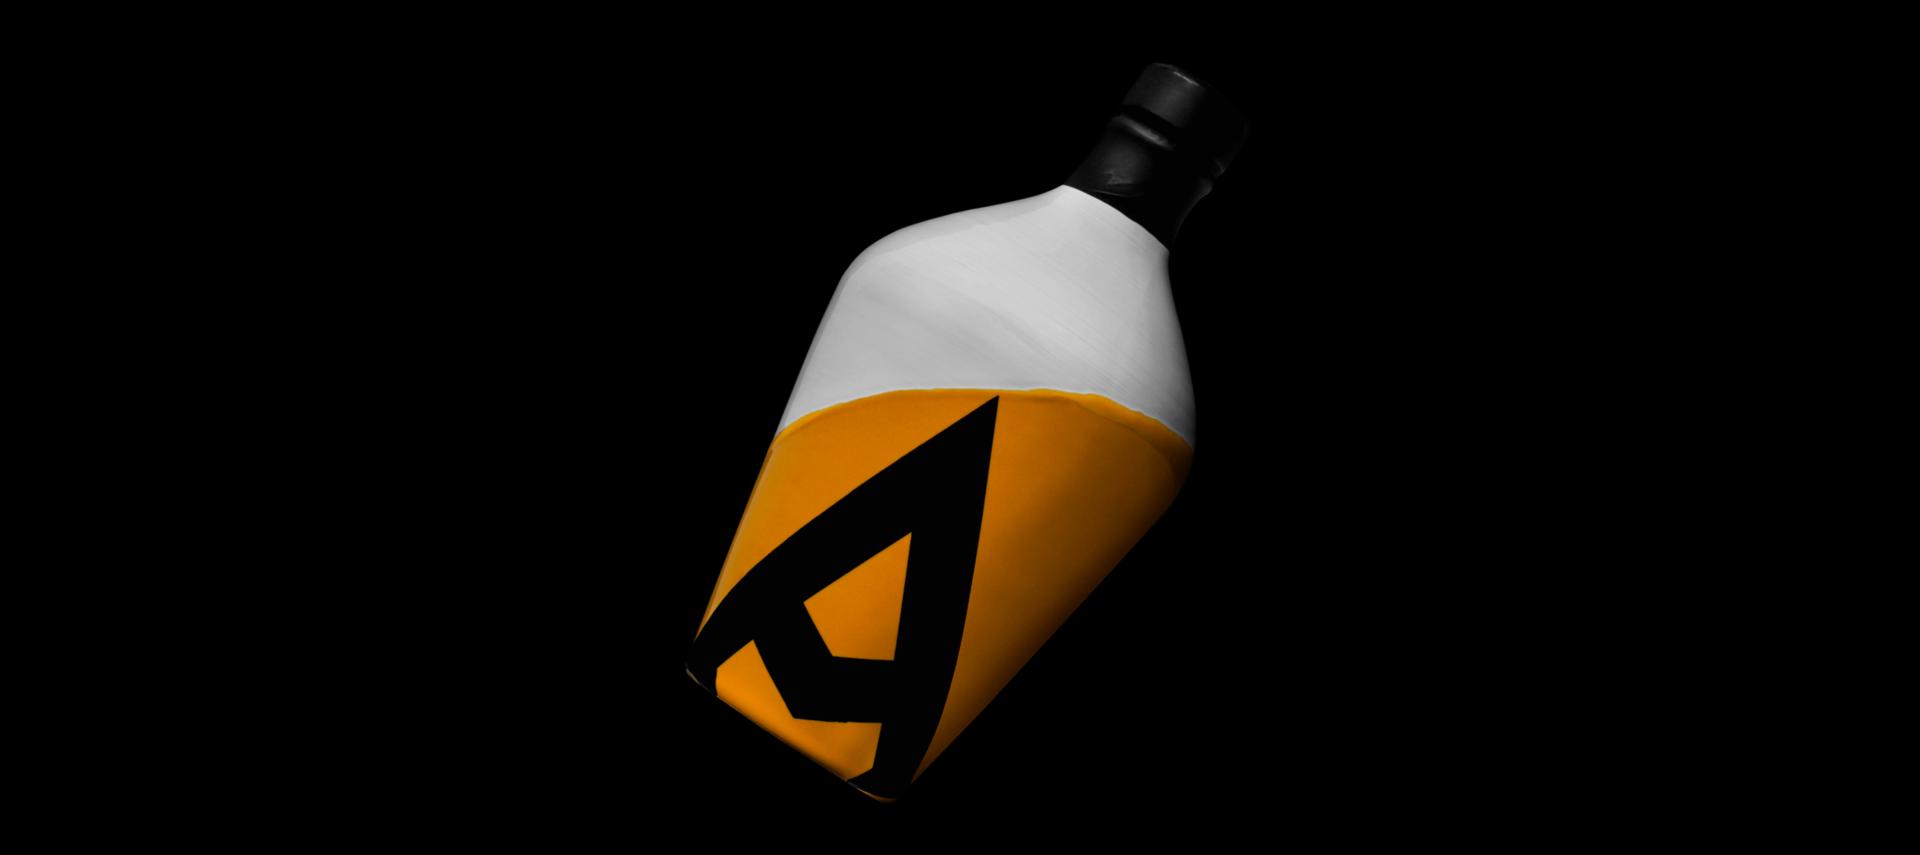 Lettera7 Create Armatore Cetara's Anchovies Extract in Ceramic Bottle